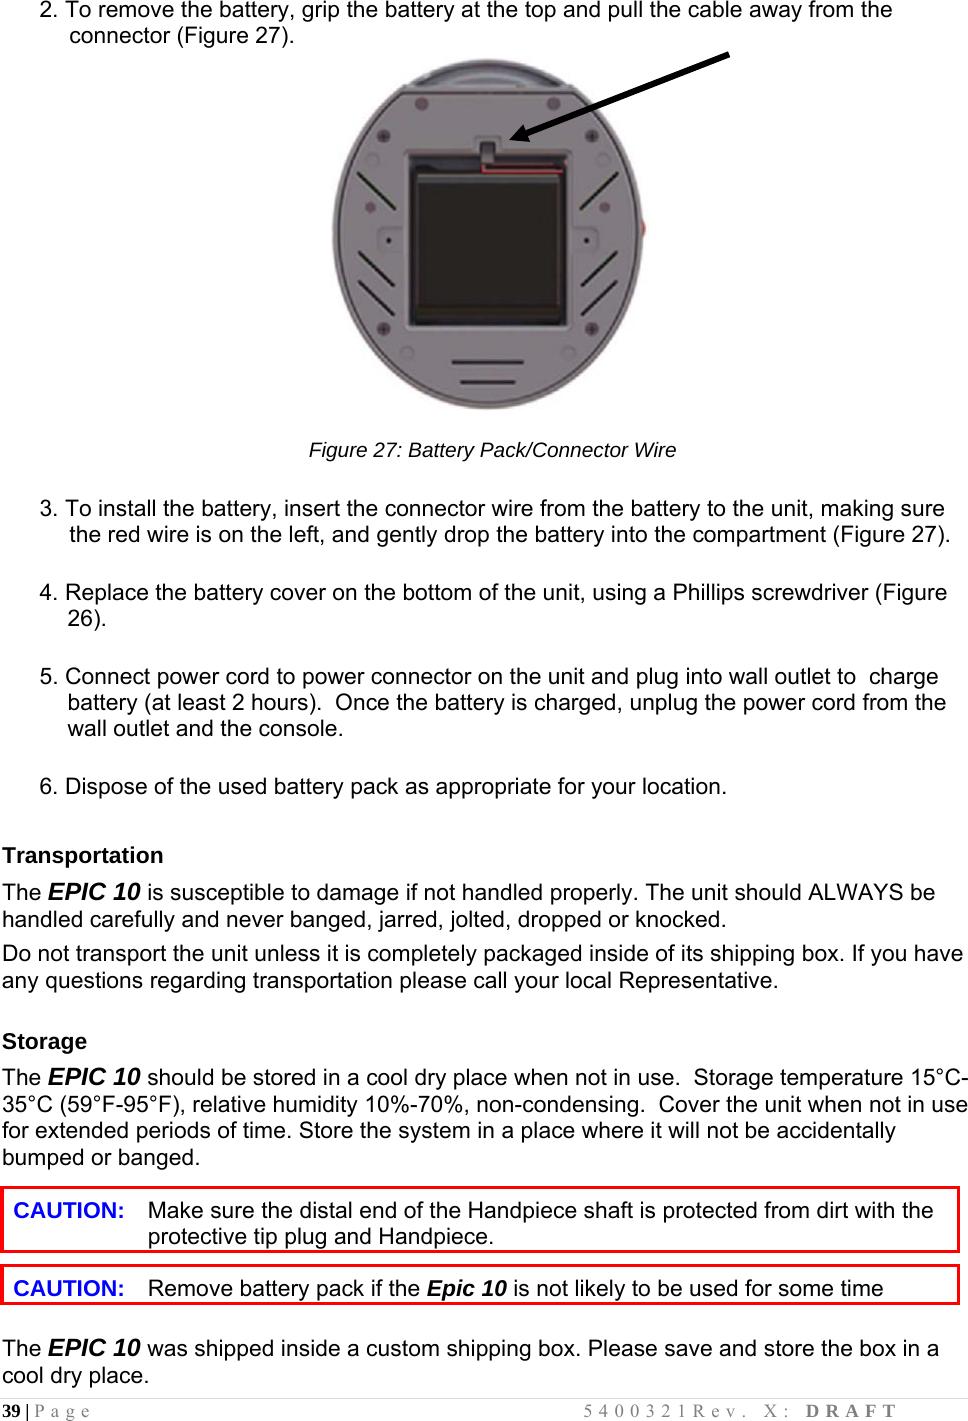 biolase epic epic 10 dental soft tissue laser user manual 5400321 50912x rh usermanual wiki iPad Mini User Guide HP Electronic User Guide